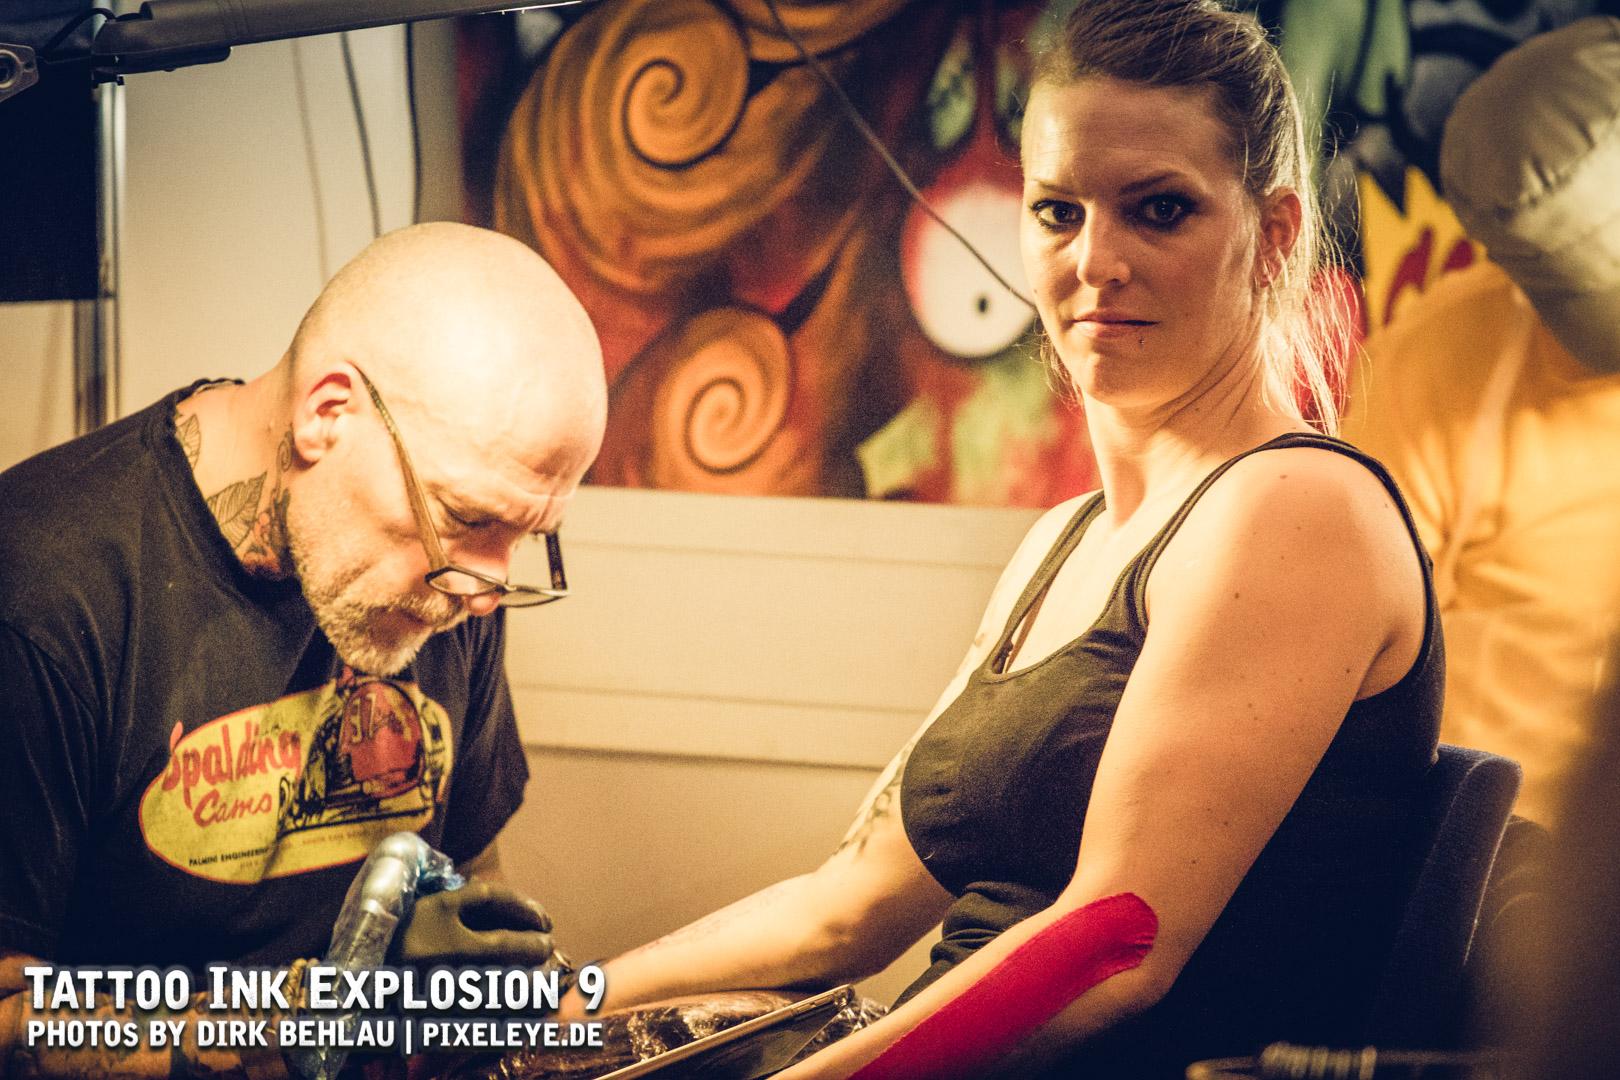 Tattoo Ink Explosion 2018 WEB by Dirk Behlau-1345.jpg